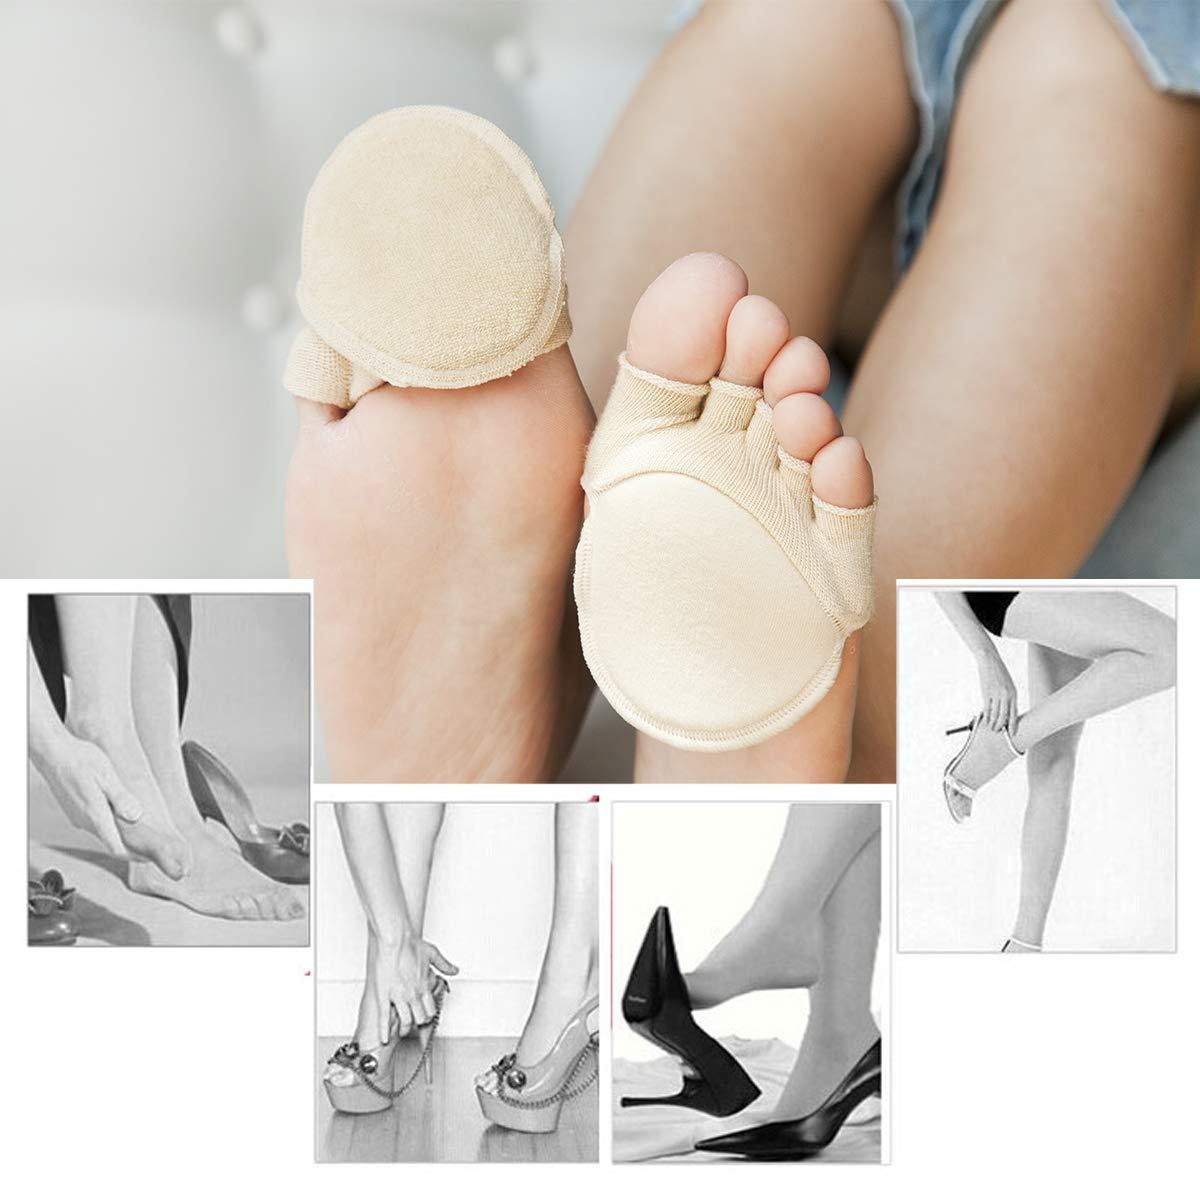 Toe Socks, Cotton Non-Slip Women's Toe Toppers Socks Toe Separating Socks No-Show Half Socks Barre Pilates Yoga Half Palm Socks(2 Pairs) by Pnrskter (Image #2)